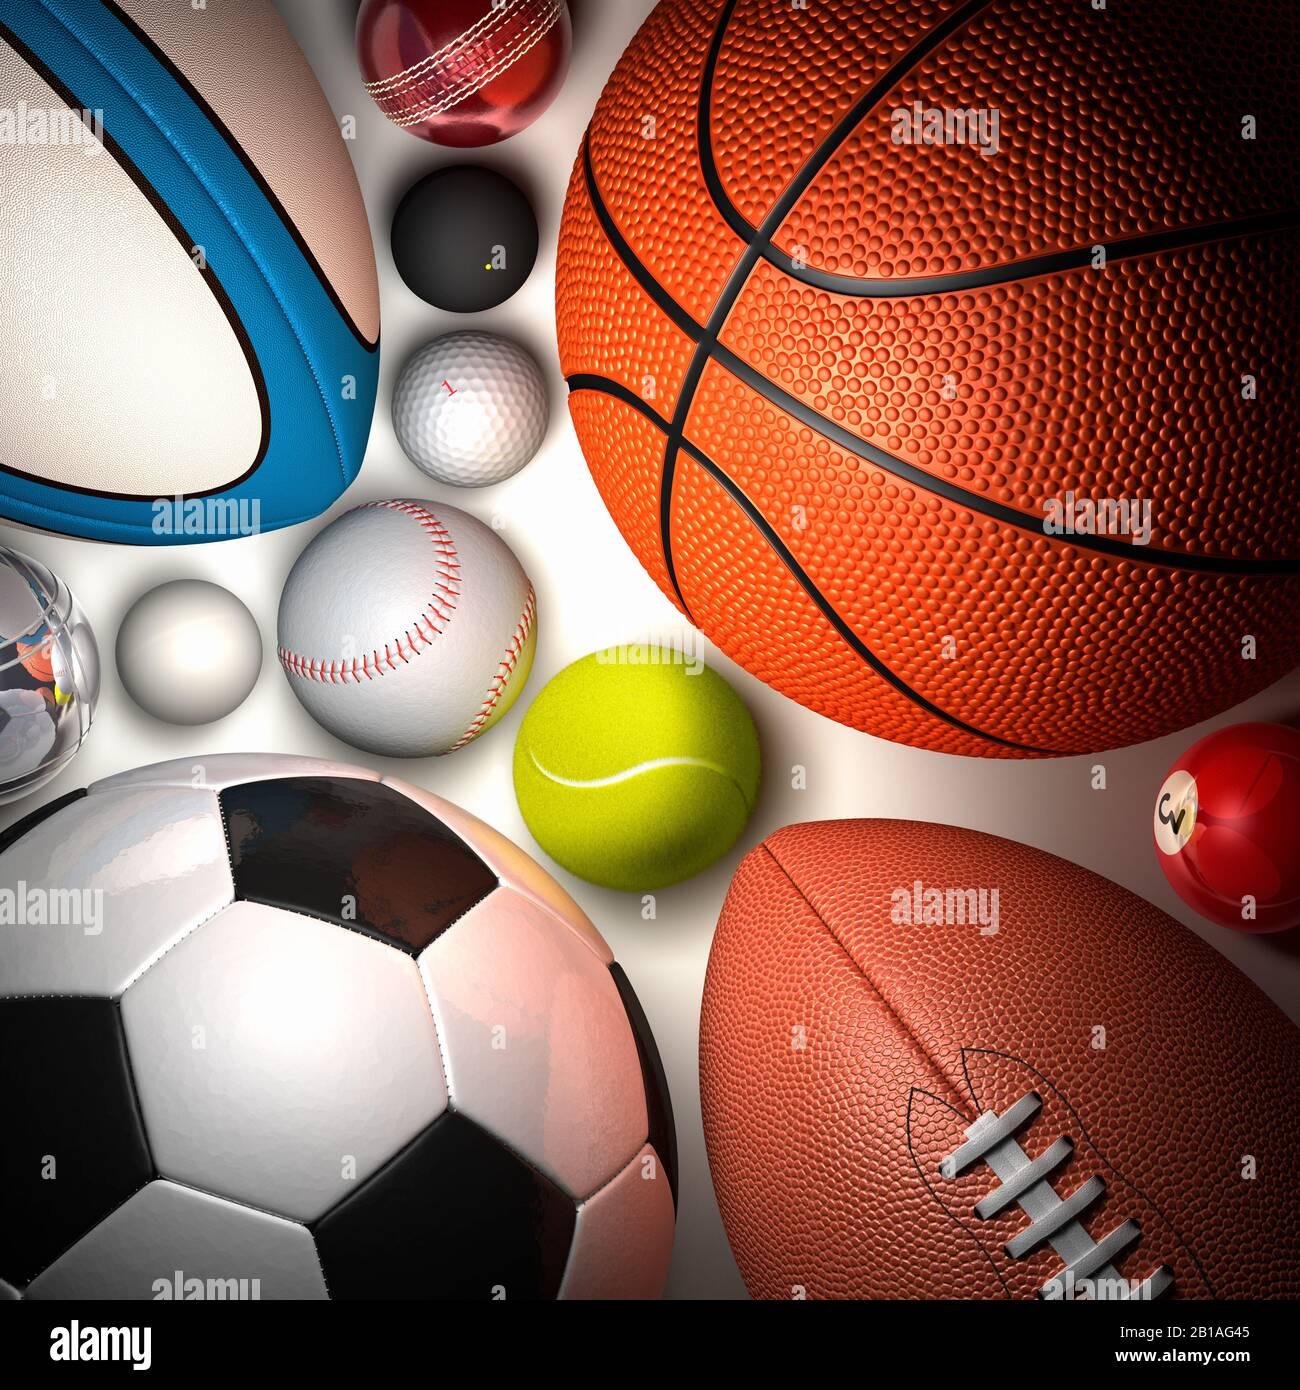 Bälle verschiedener Sportarten von oben geschossen. Ballfamilie. Fußball, Basketball, Tennis, Rugby, Baseball, Cricket, Golf, Squash, Boules, Pool, Tischtennis Stockfoto